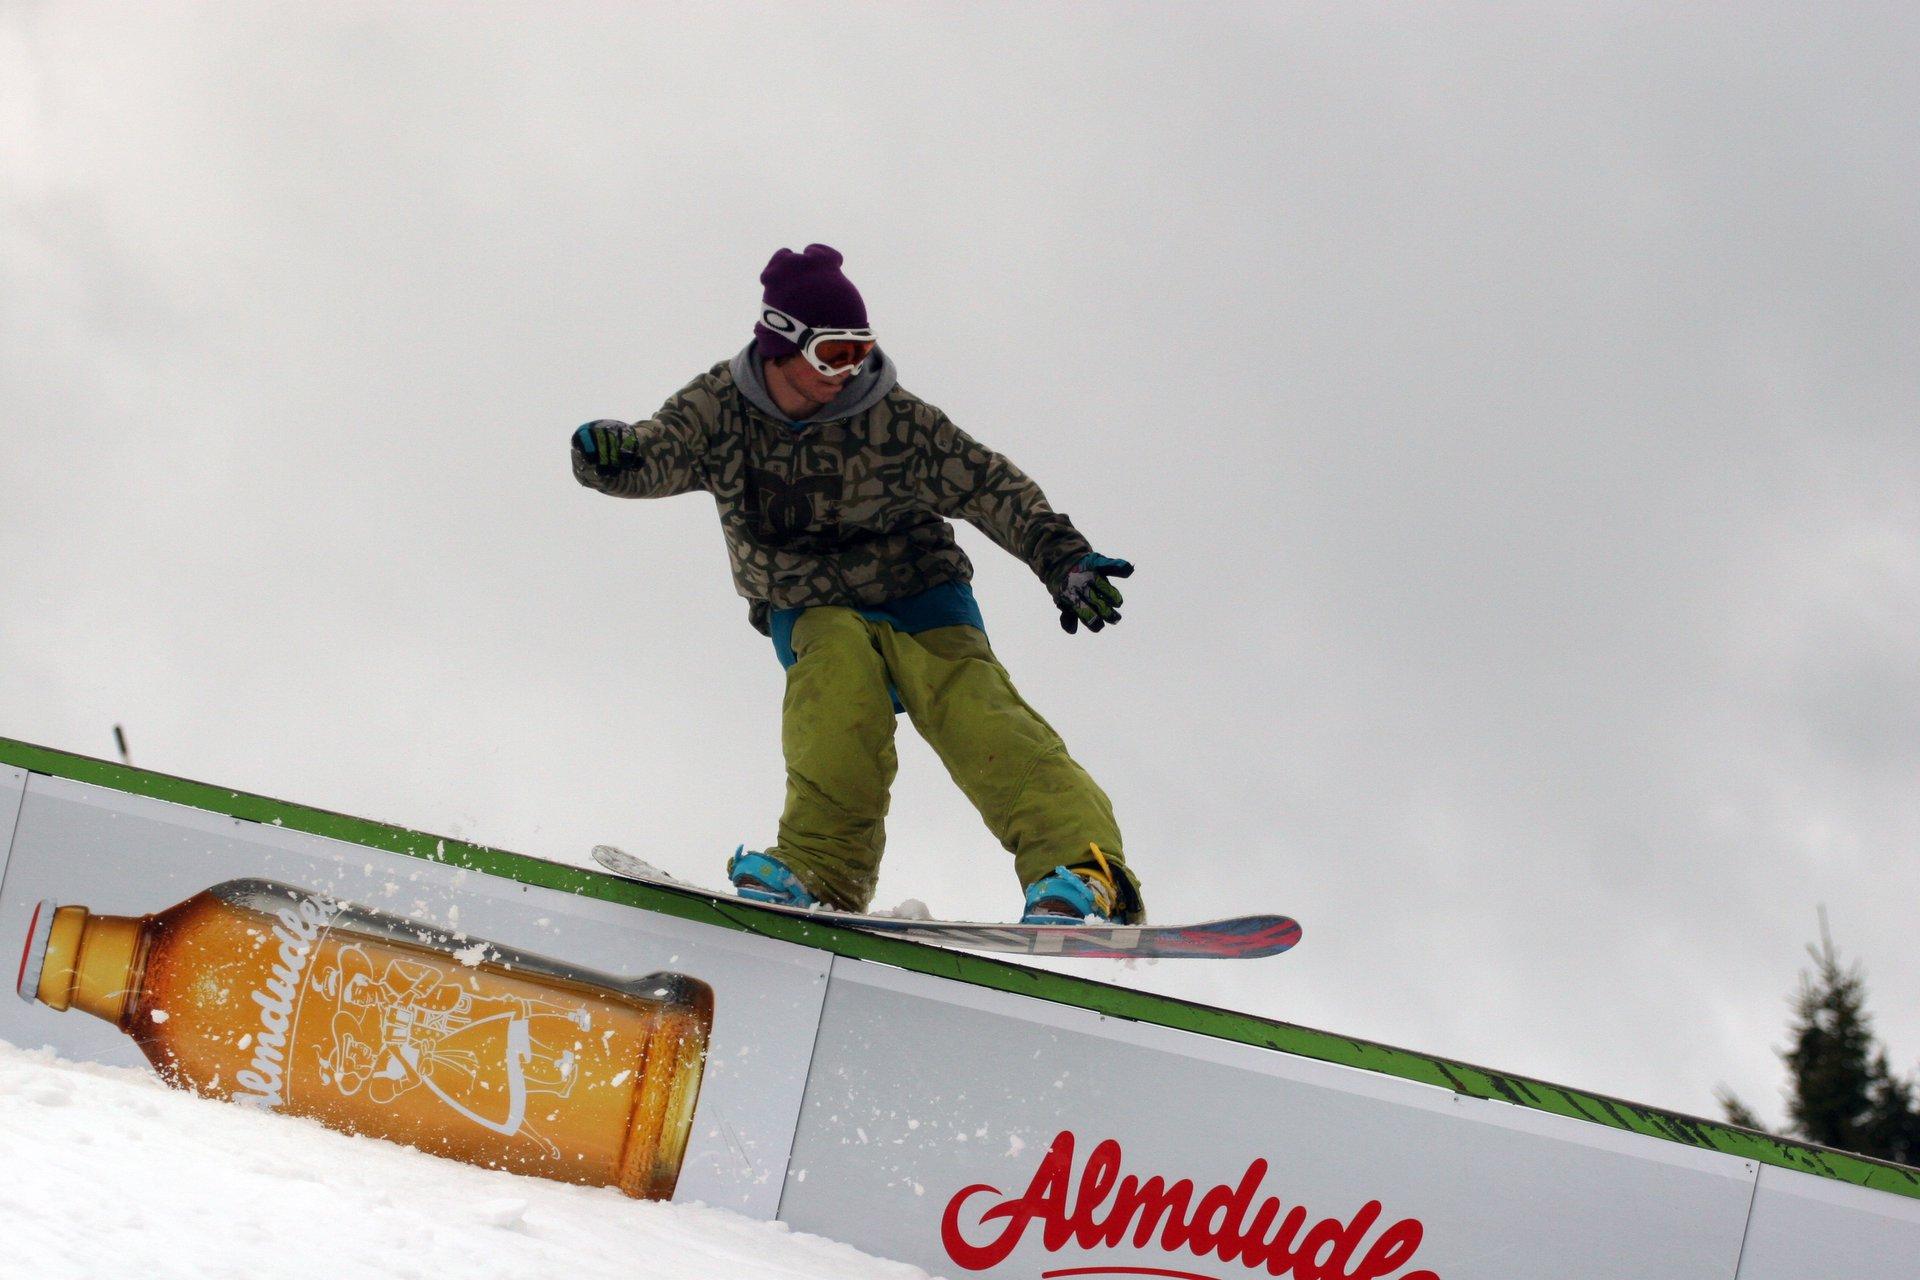 Snowboard tailpress